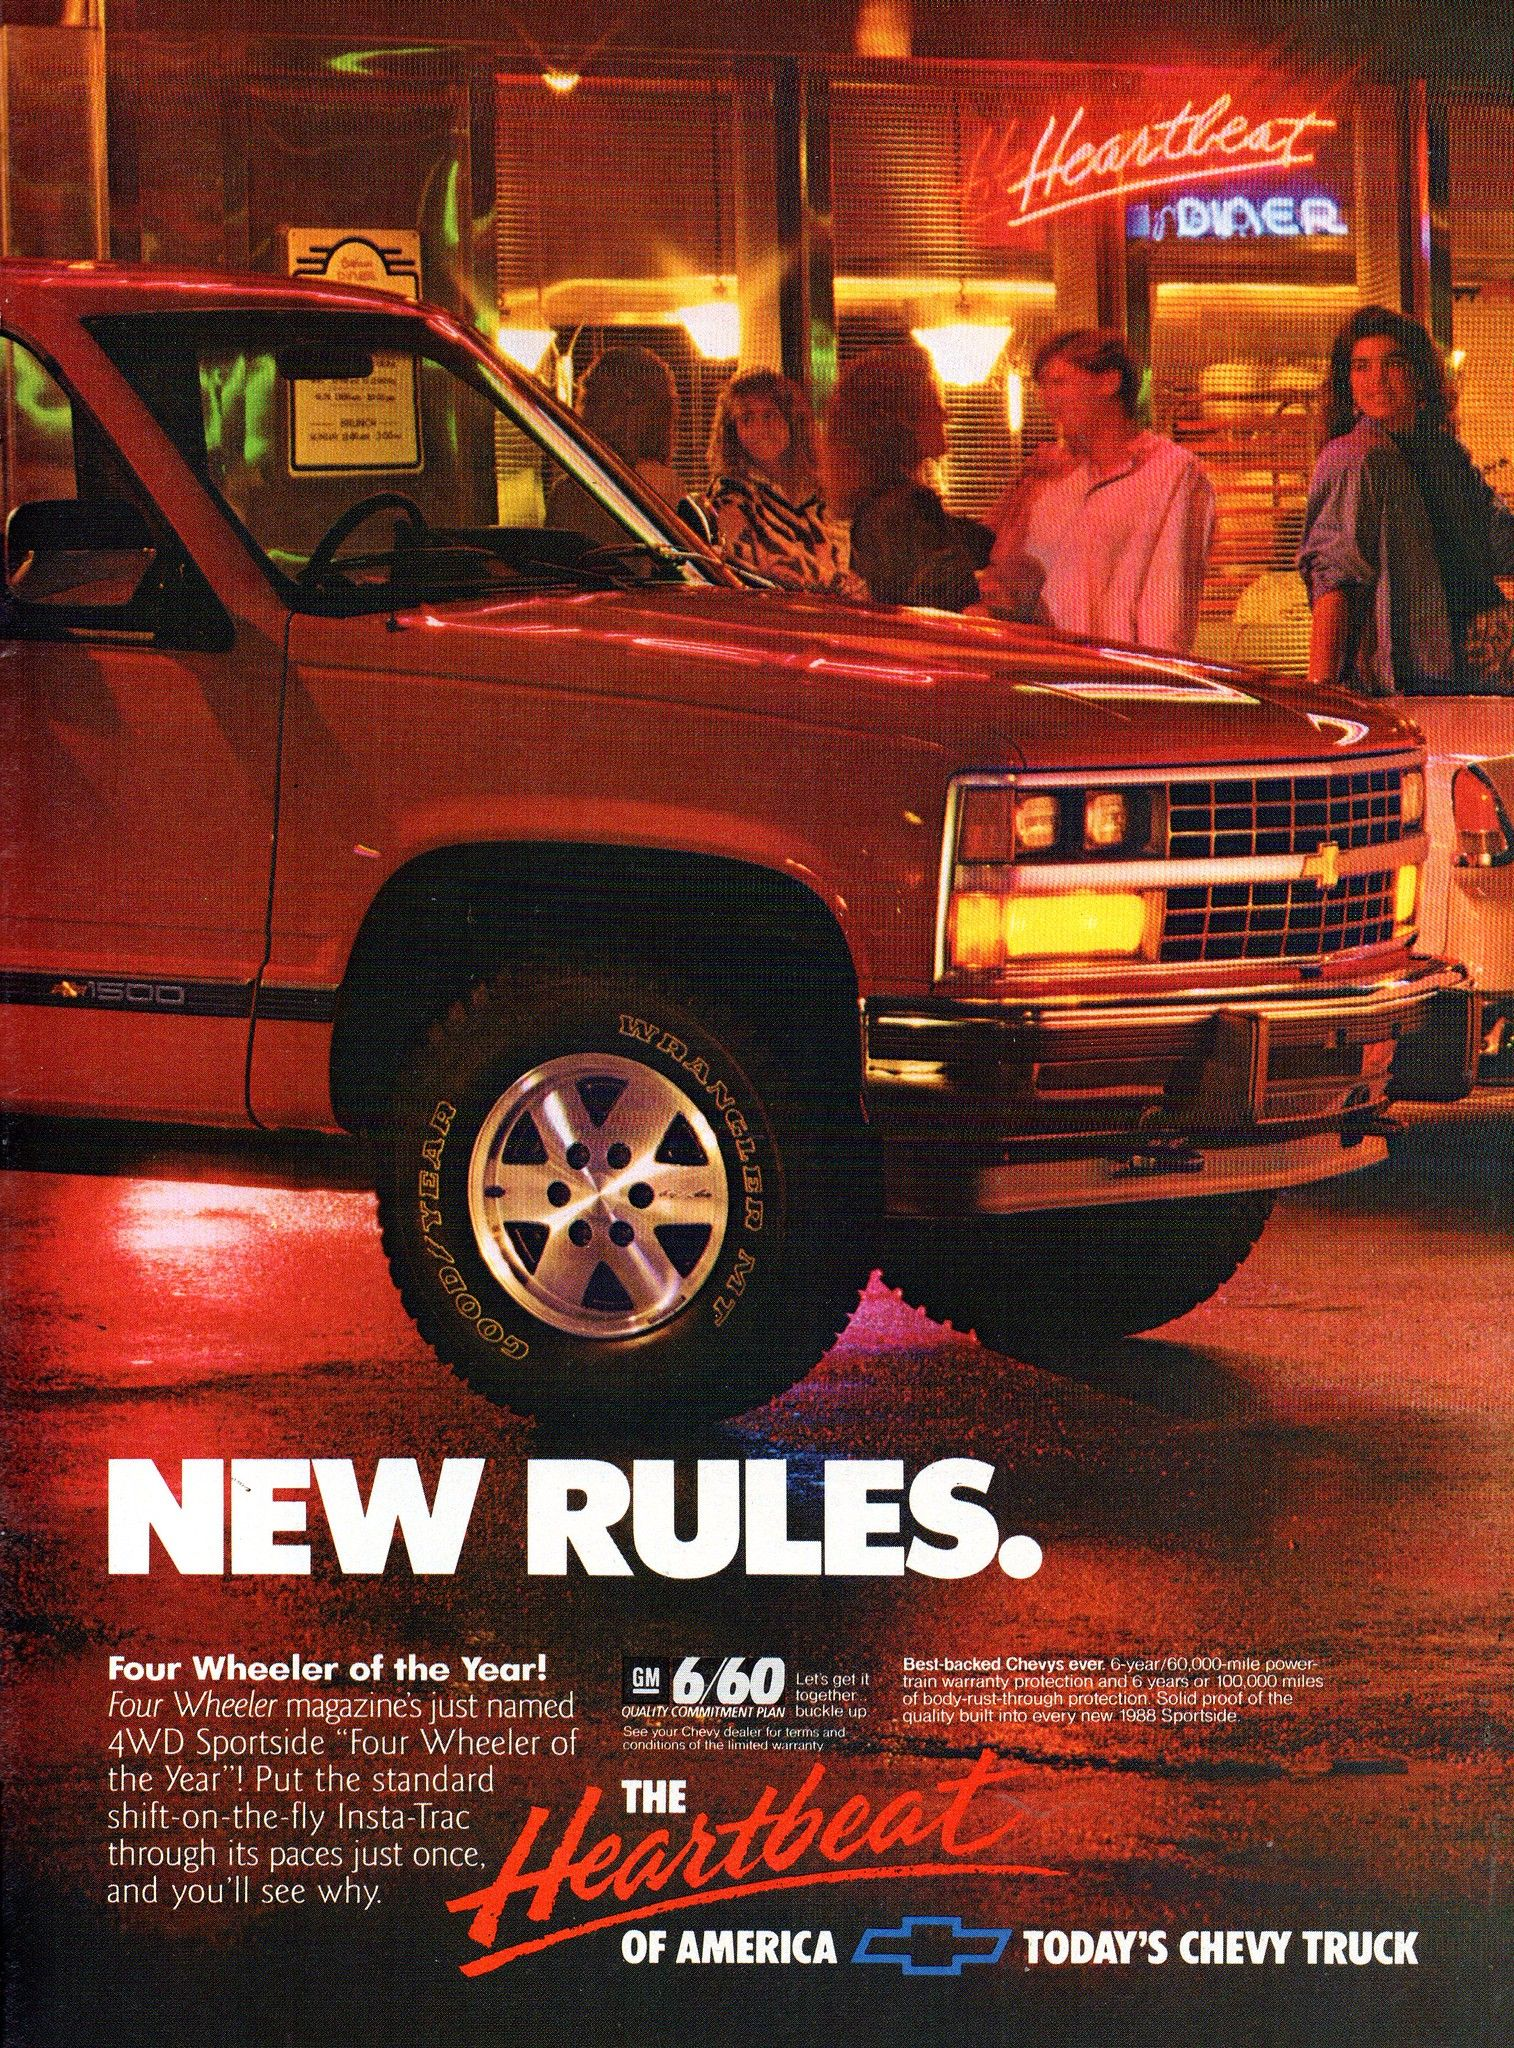 1988 Chevrolet Chevy Sportside 4wd Pickup Page 2 Usa Original